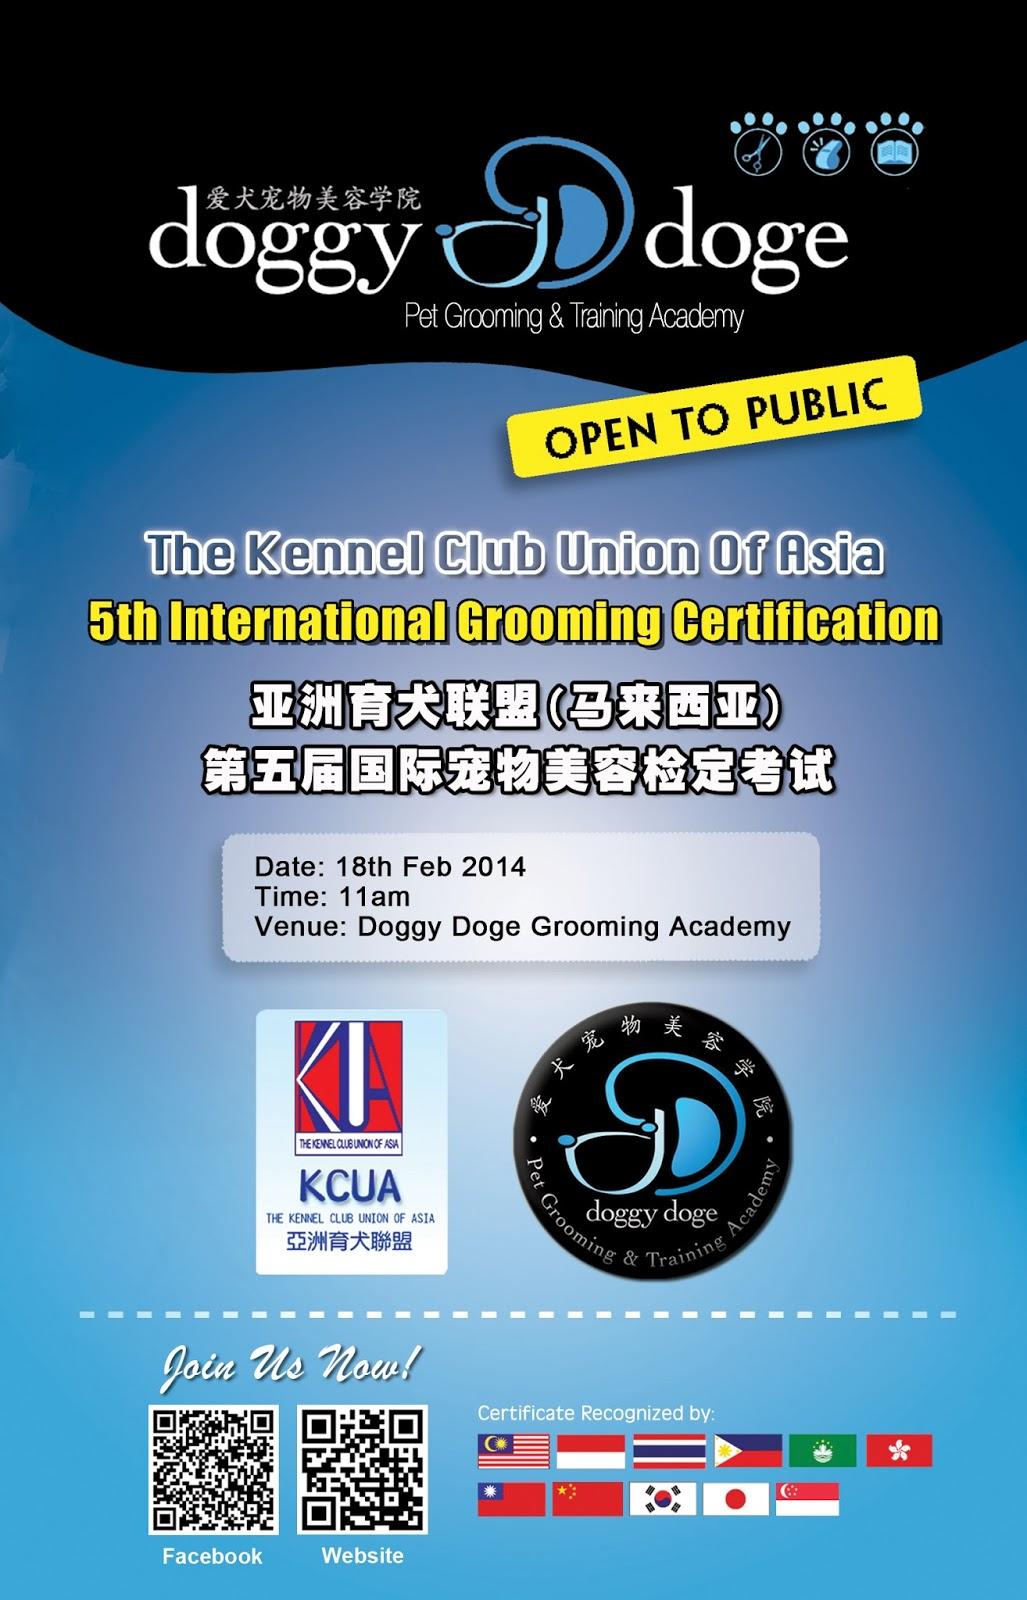 Kcua 3rd International Grooming Certification 2011 Doggydoge